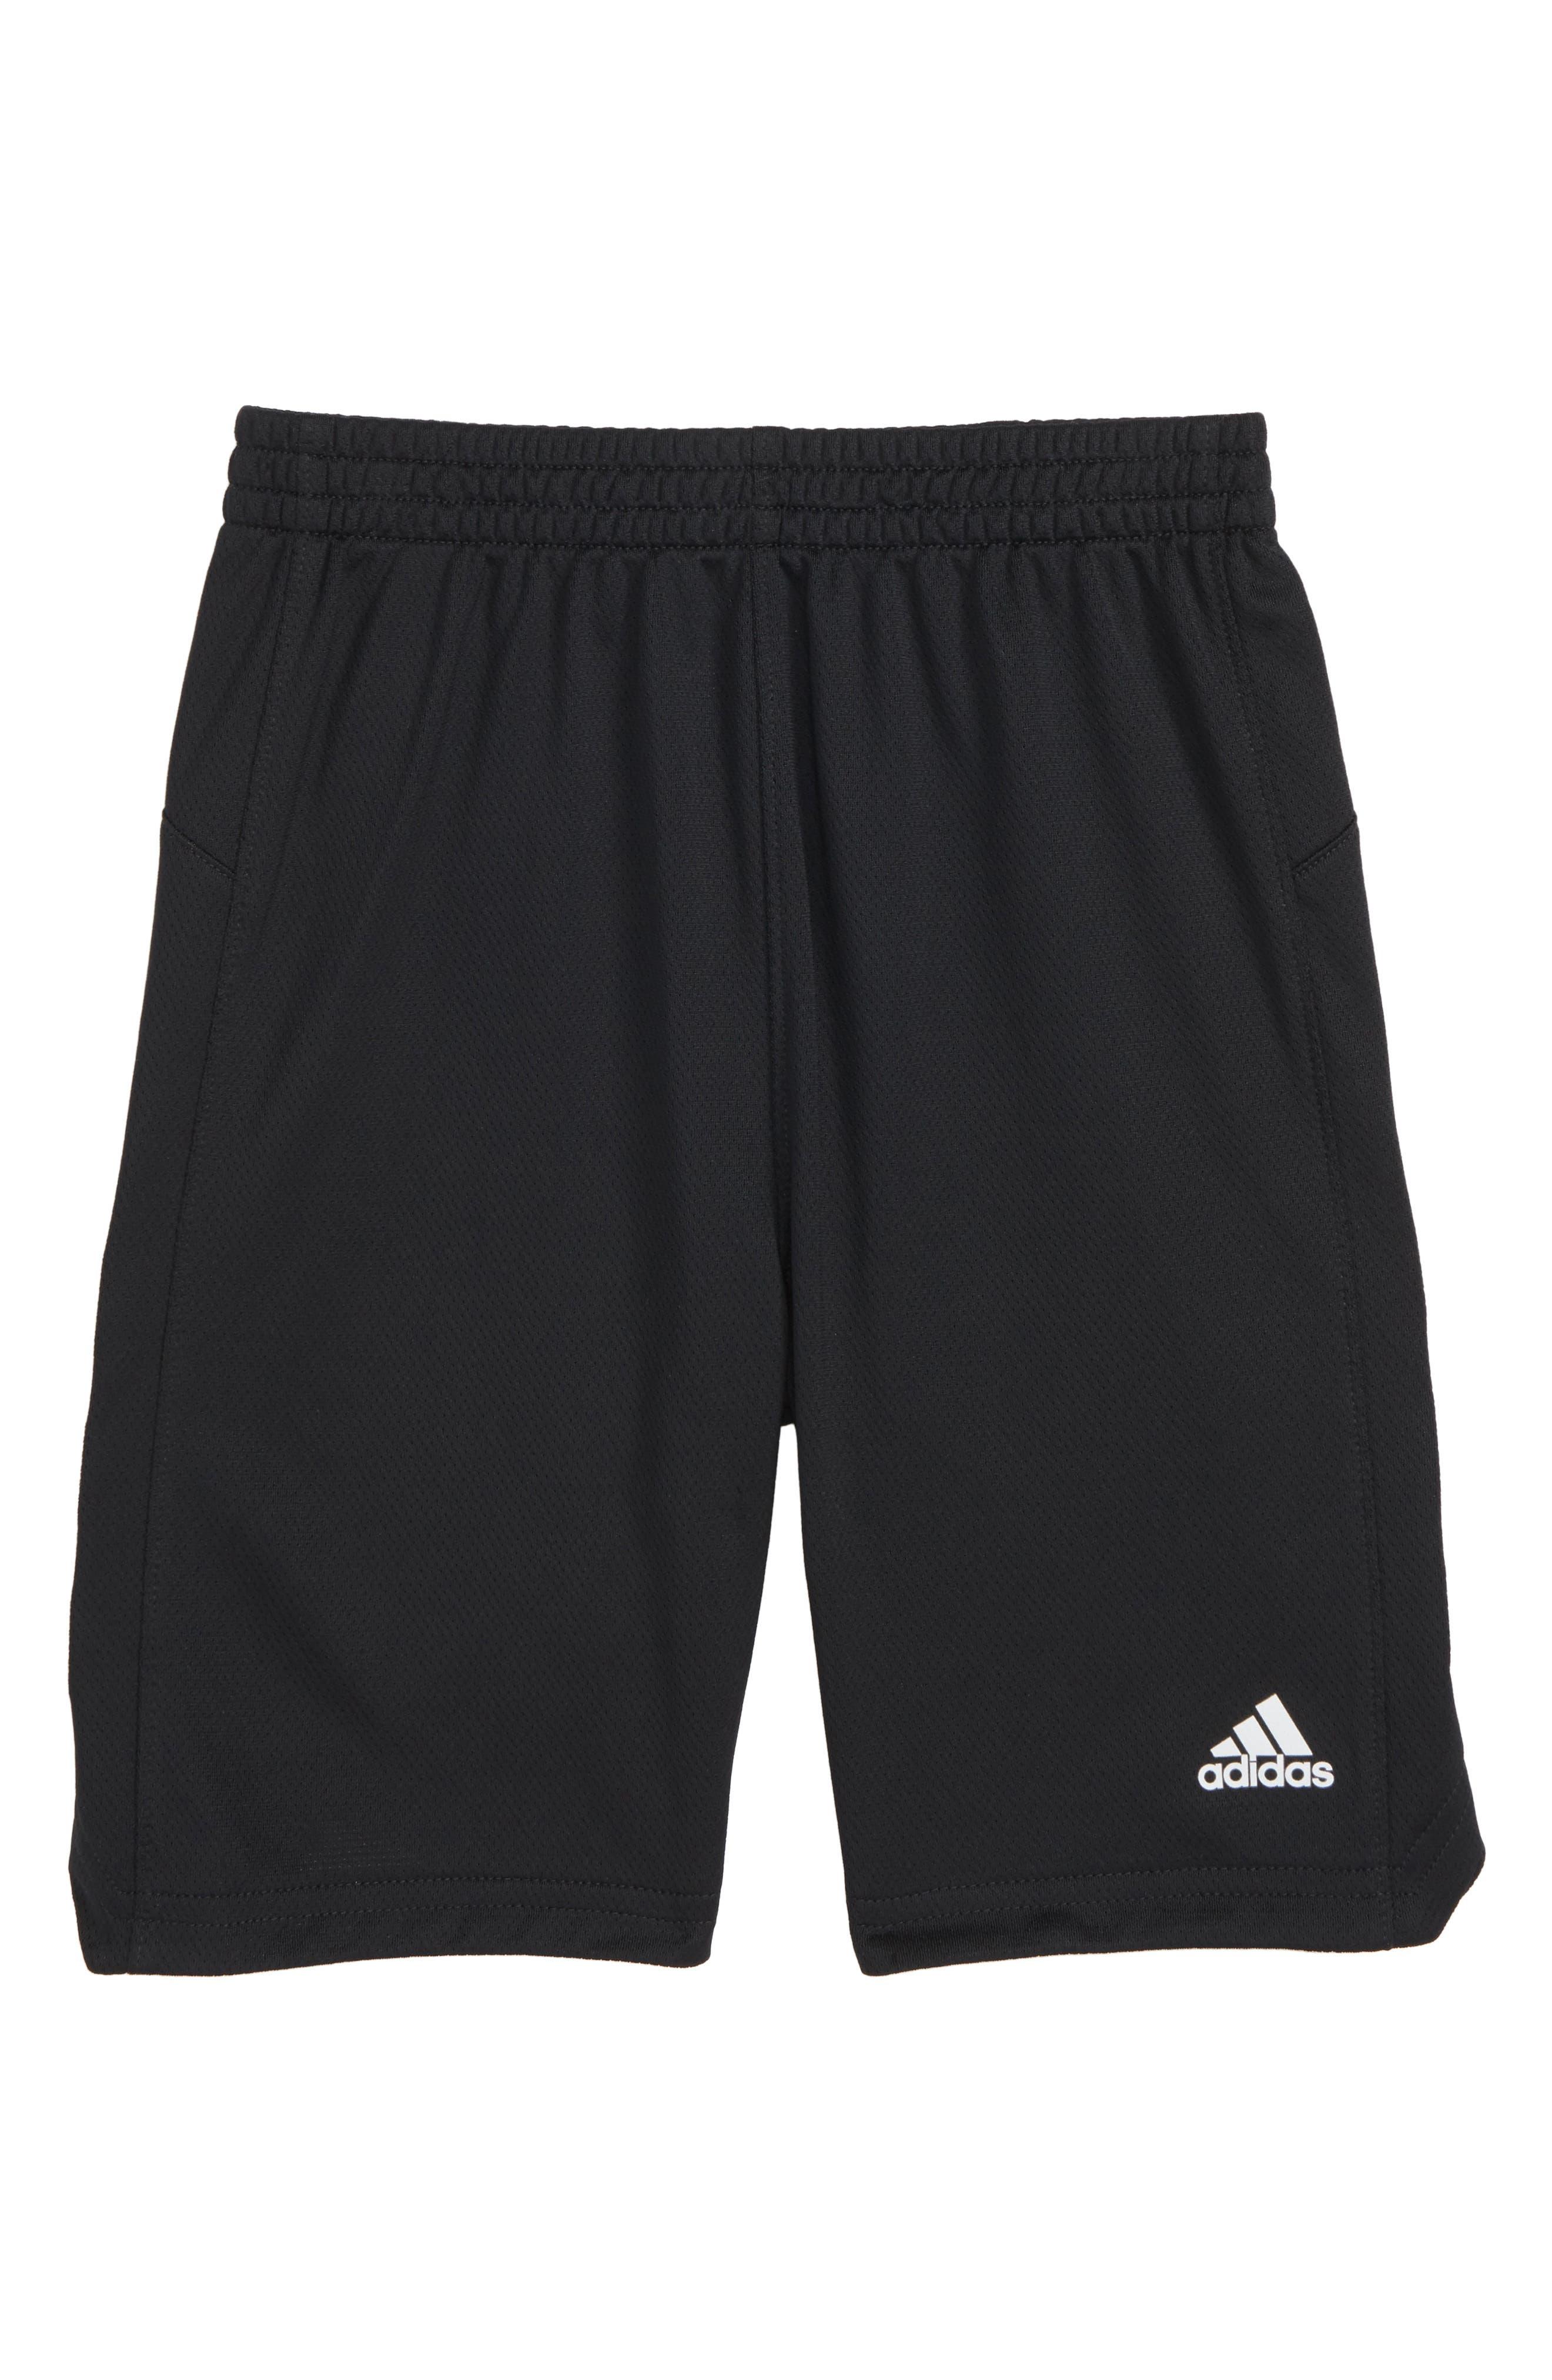 Sport Shorts,                             Main thumbnail 1, color,                             Black